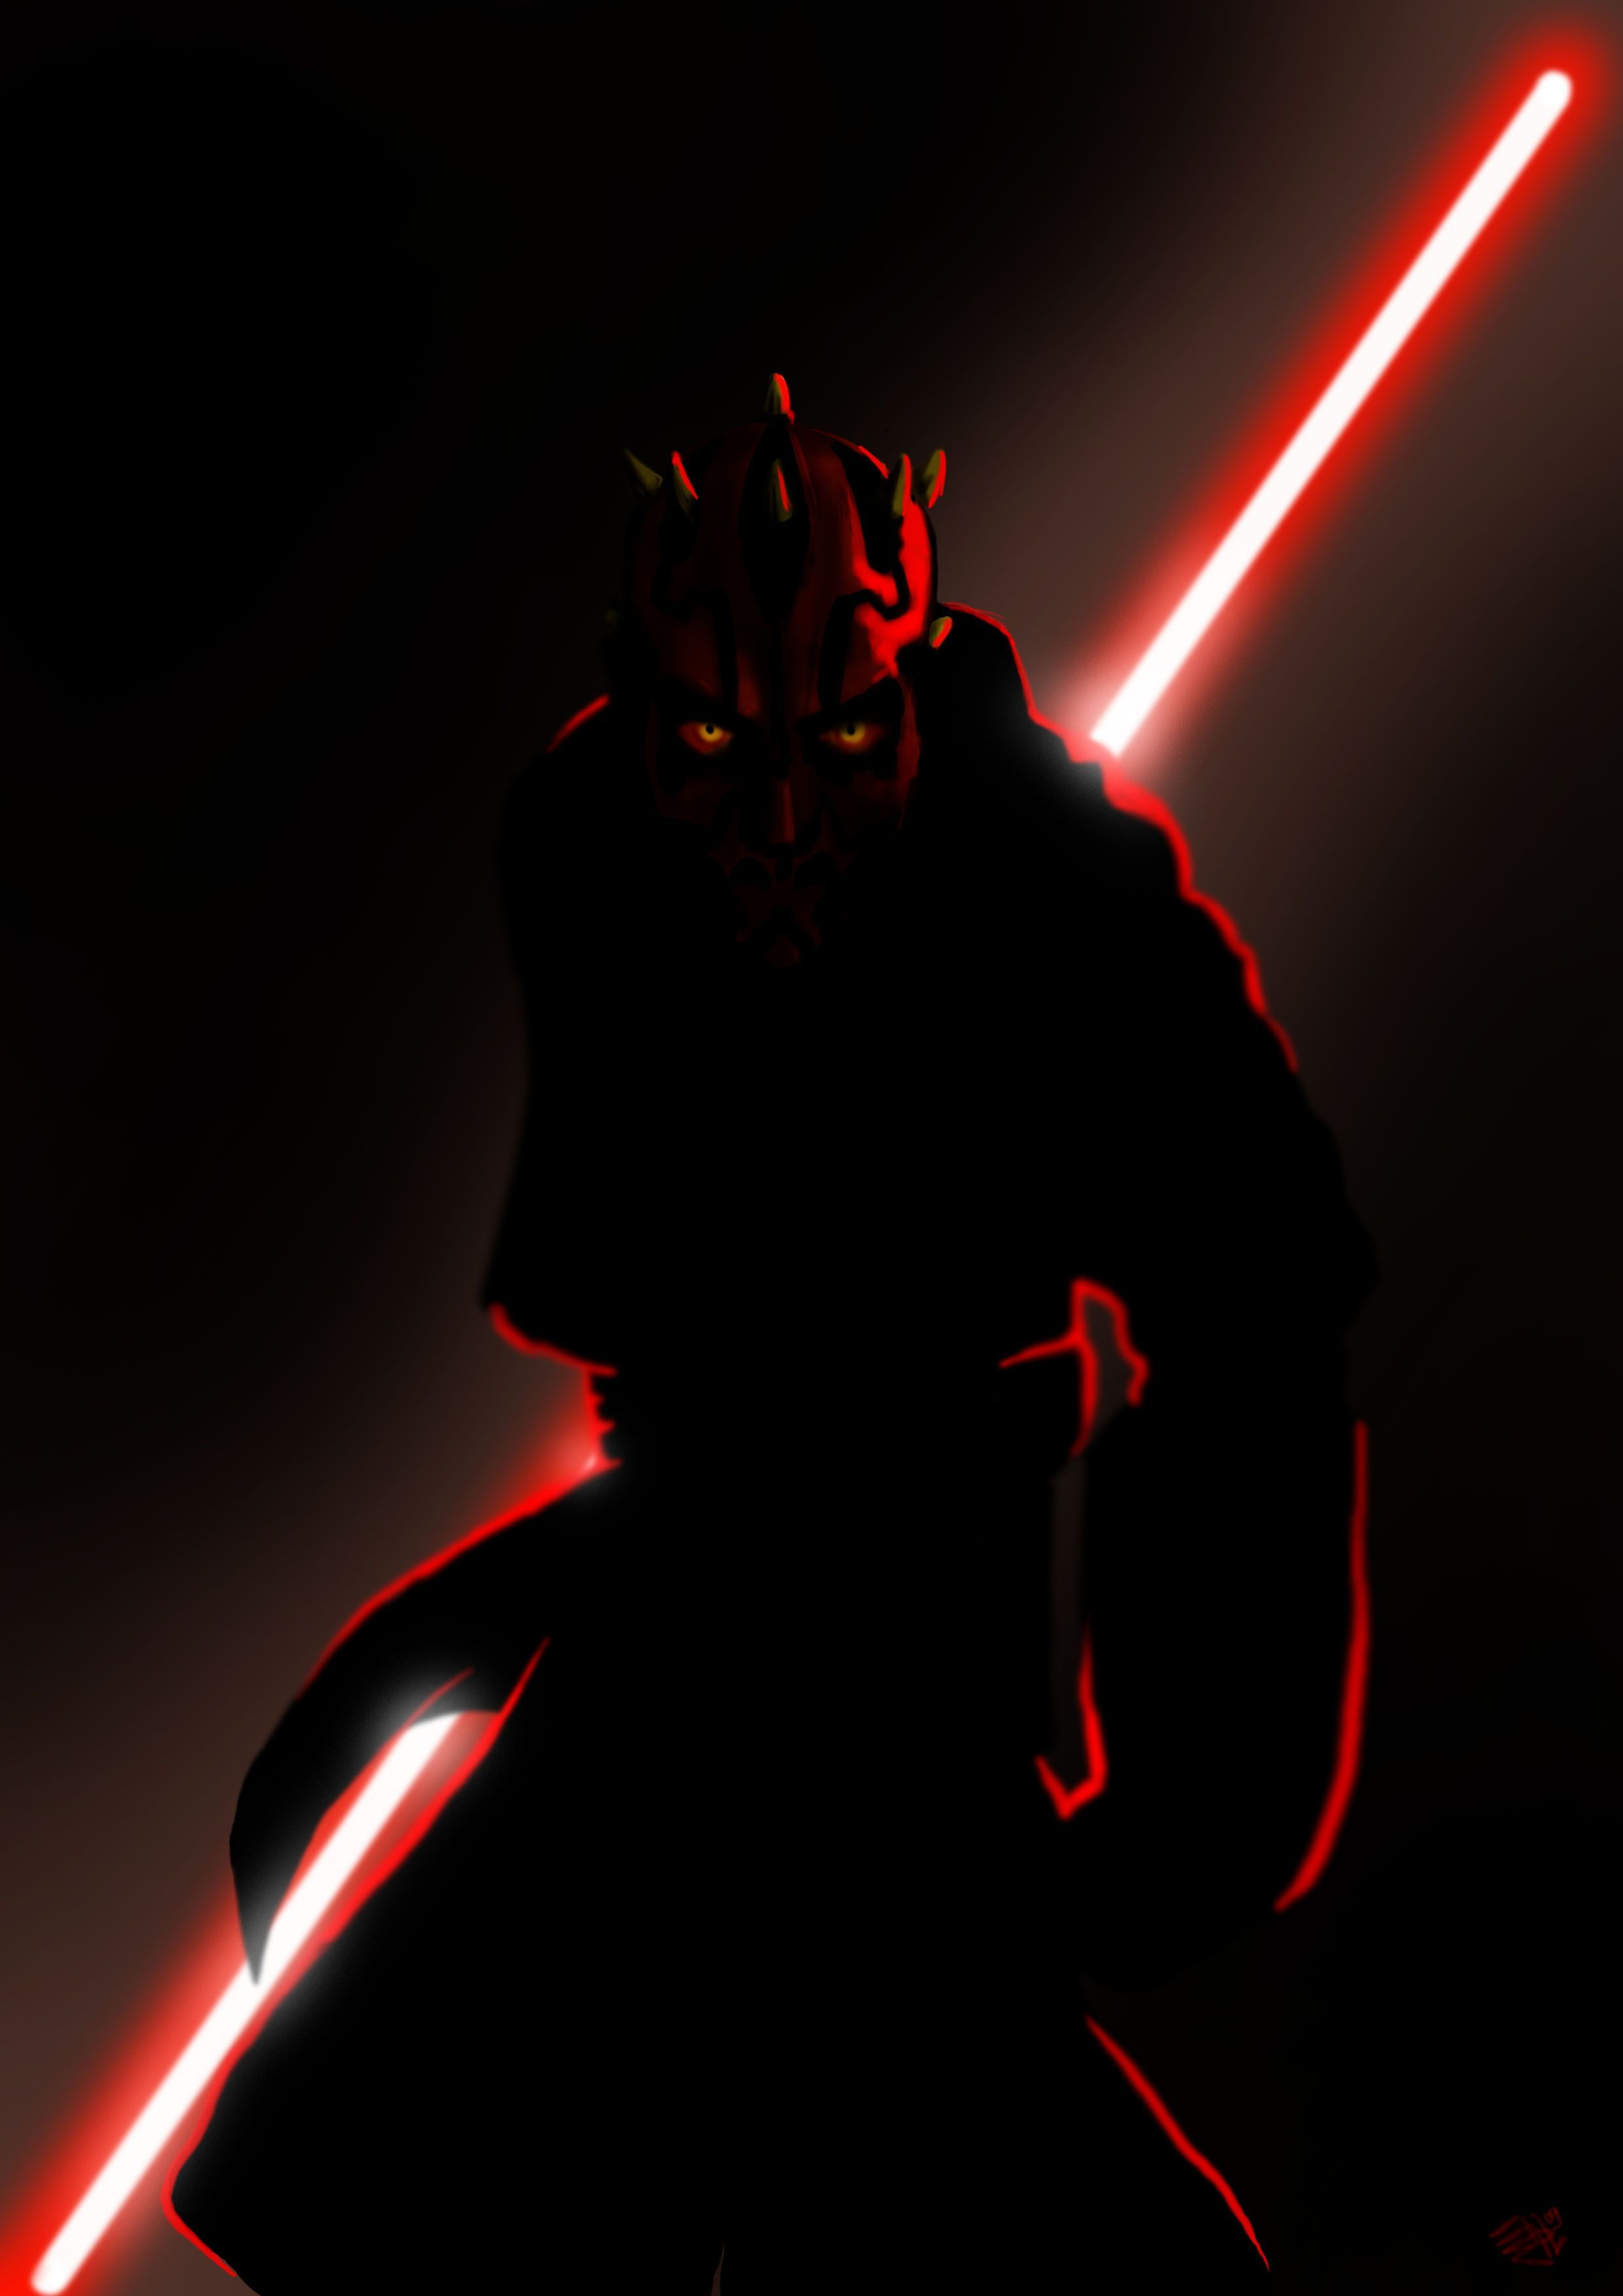 Star Wars Darth Maul Wallpapers Top Free Star Wars Darth Maul Backgrounds Wallpaperaccess